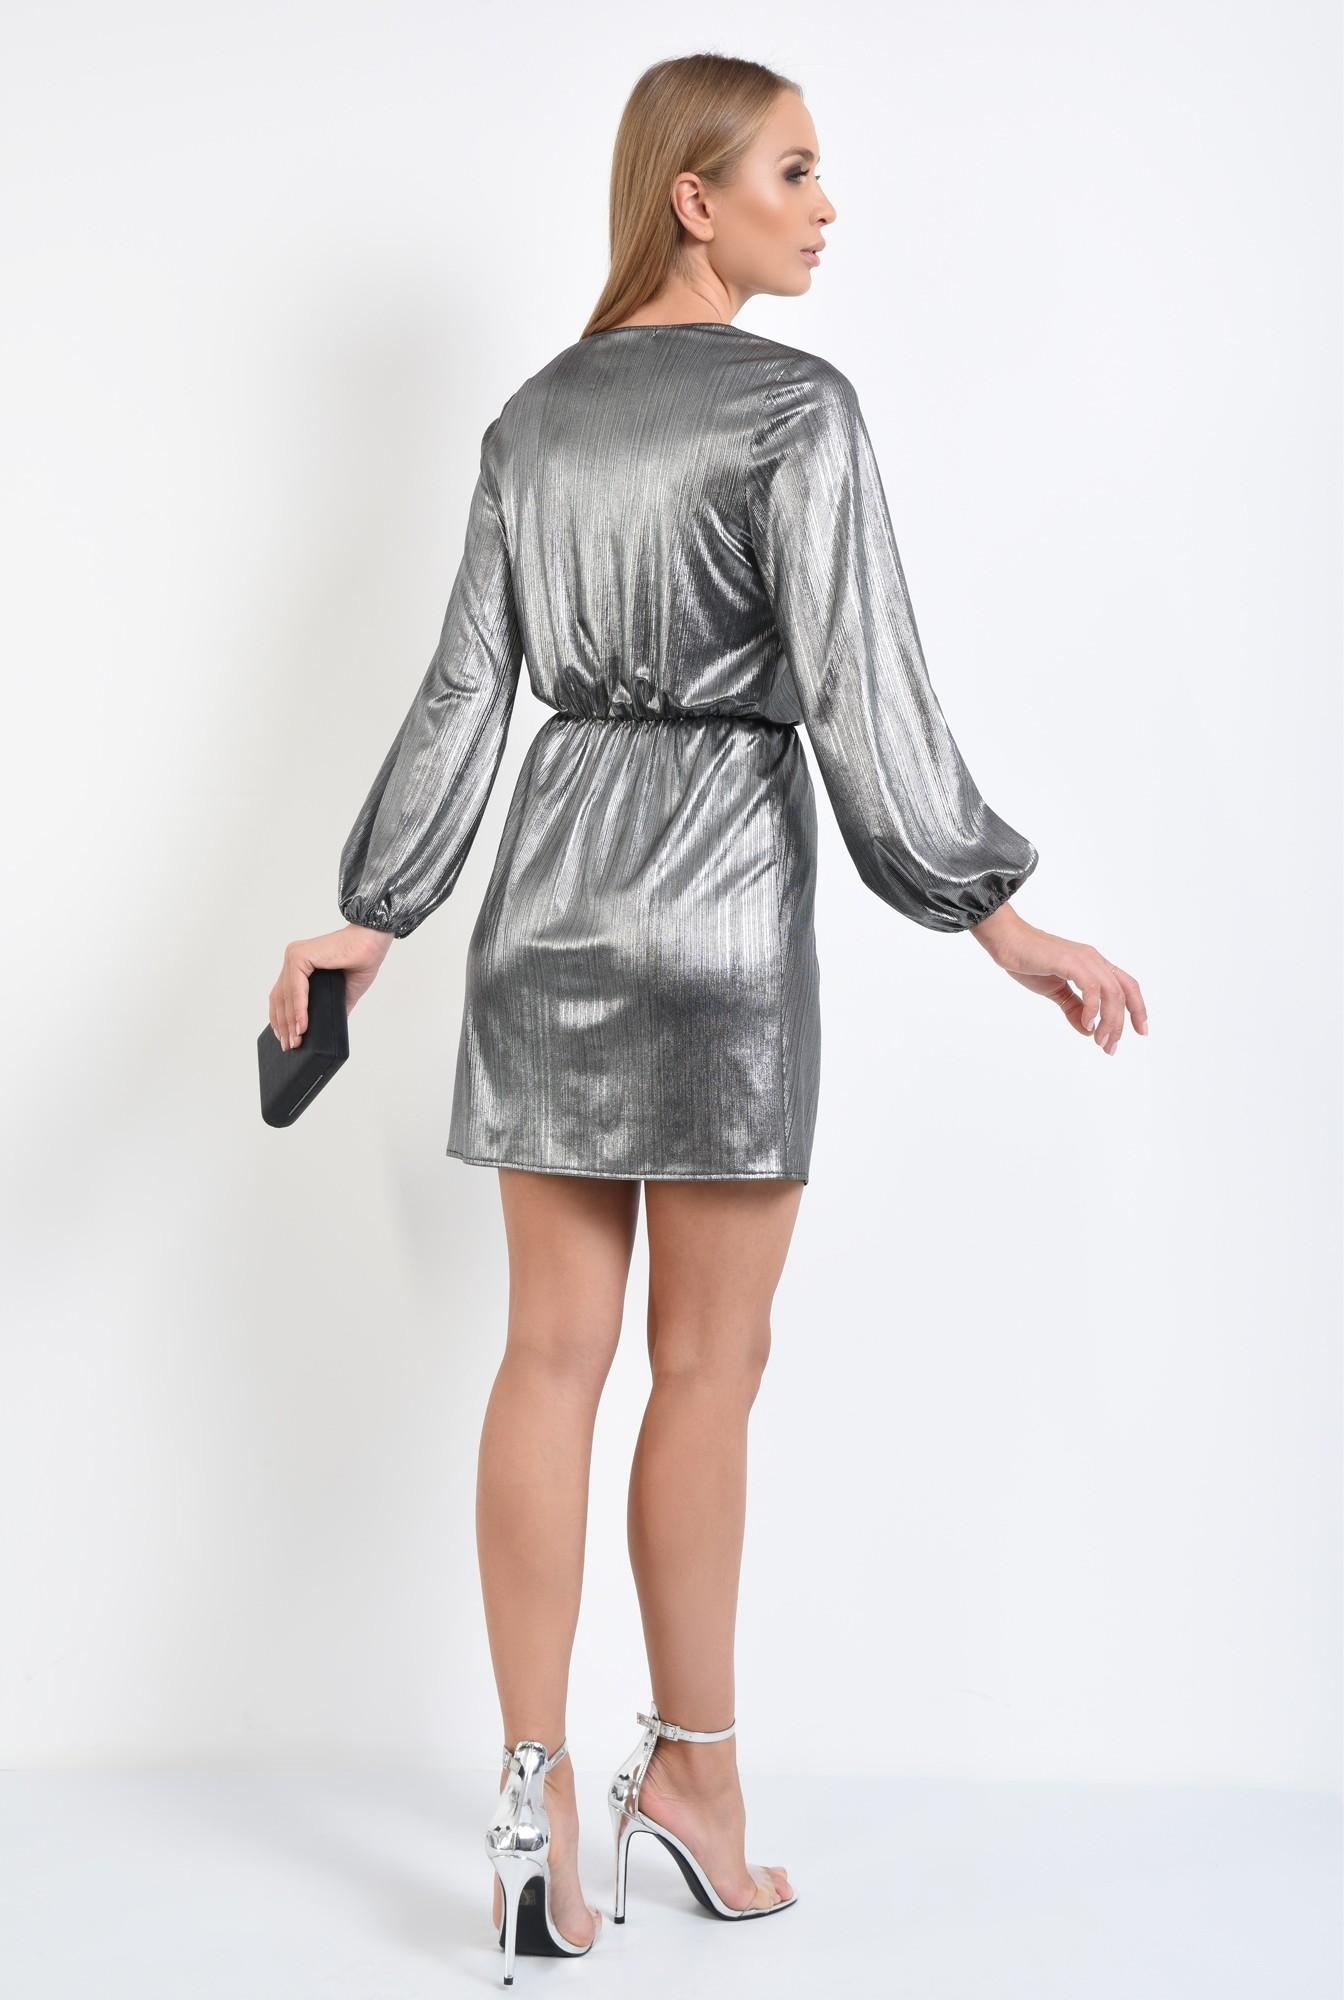 1 - rochie de seara, lurex argintiu, talie elastica, anchior petrecut